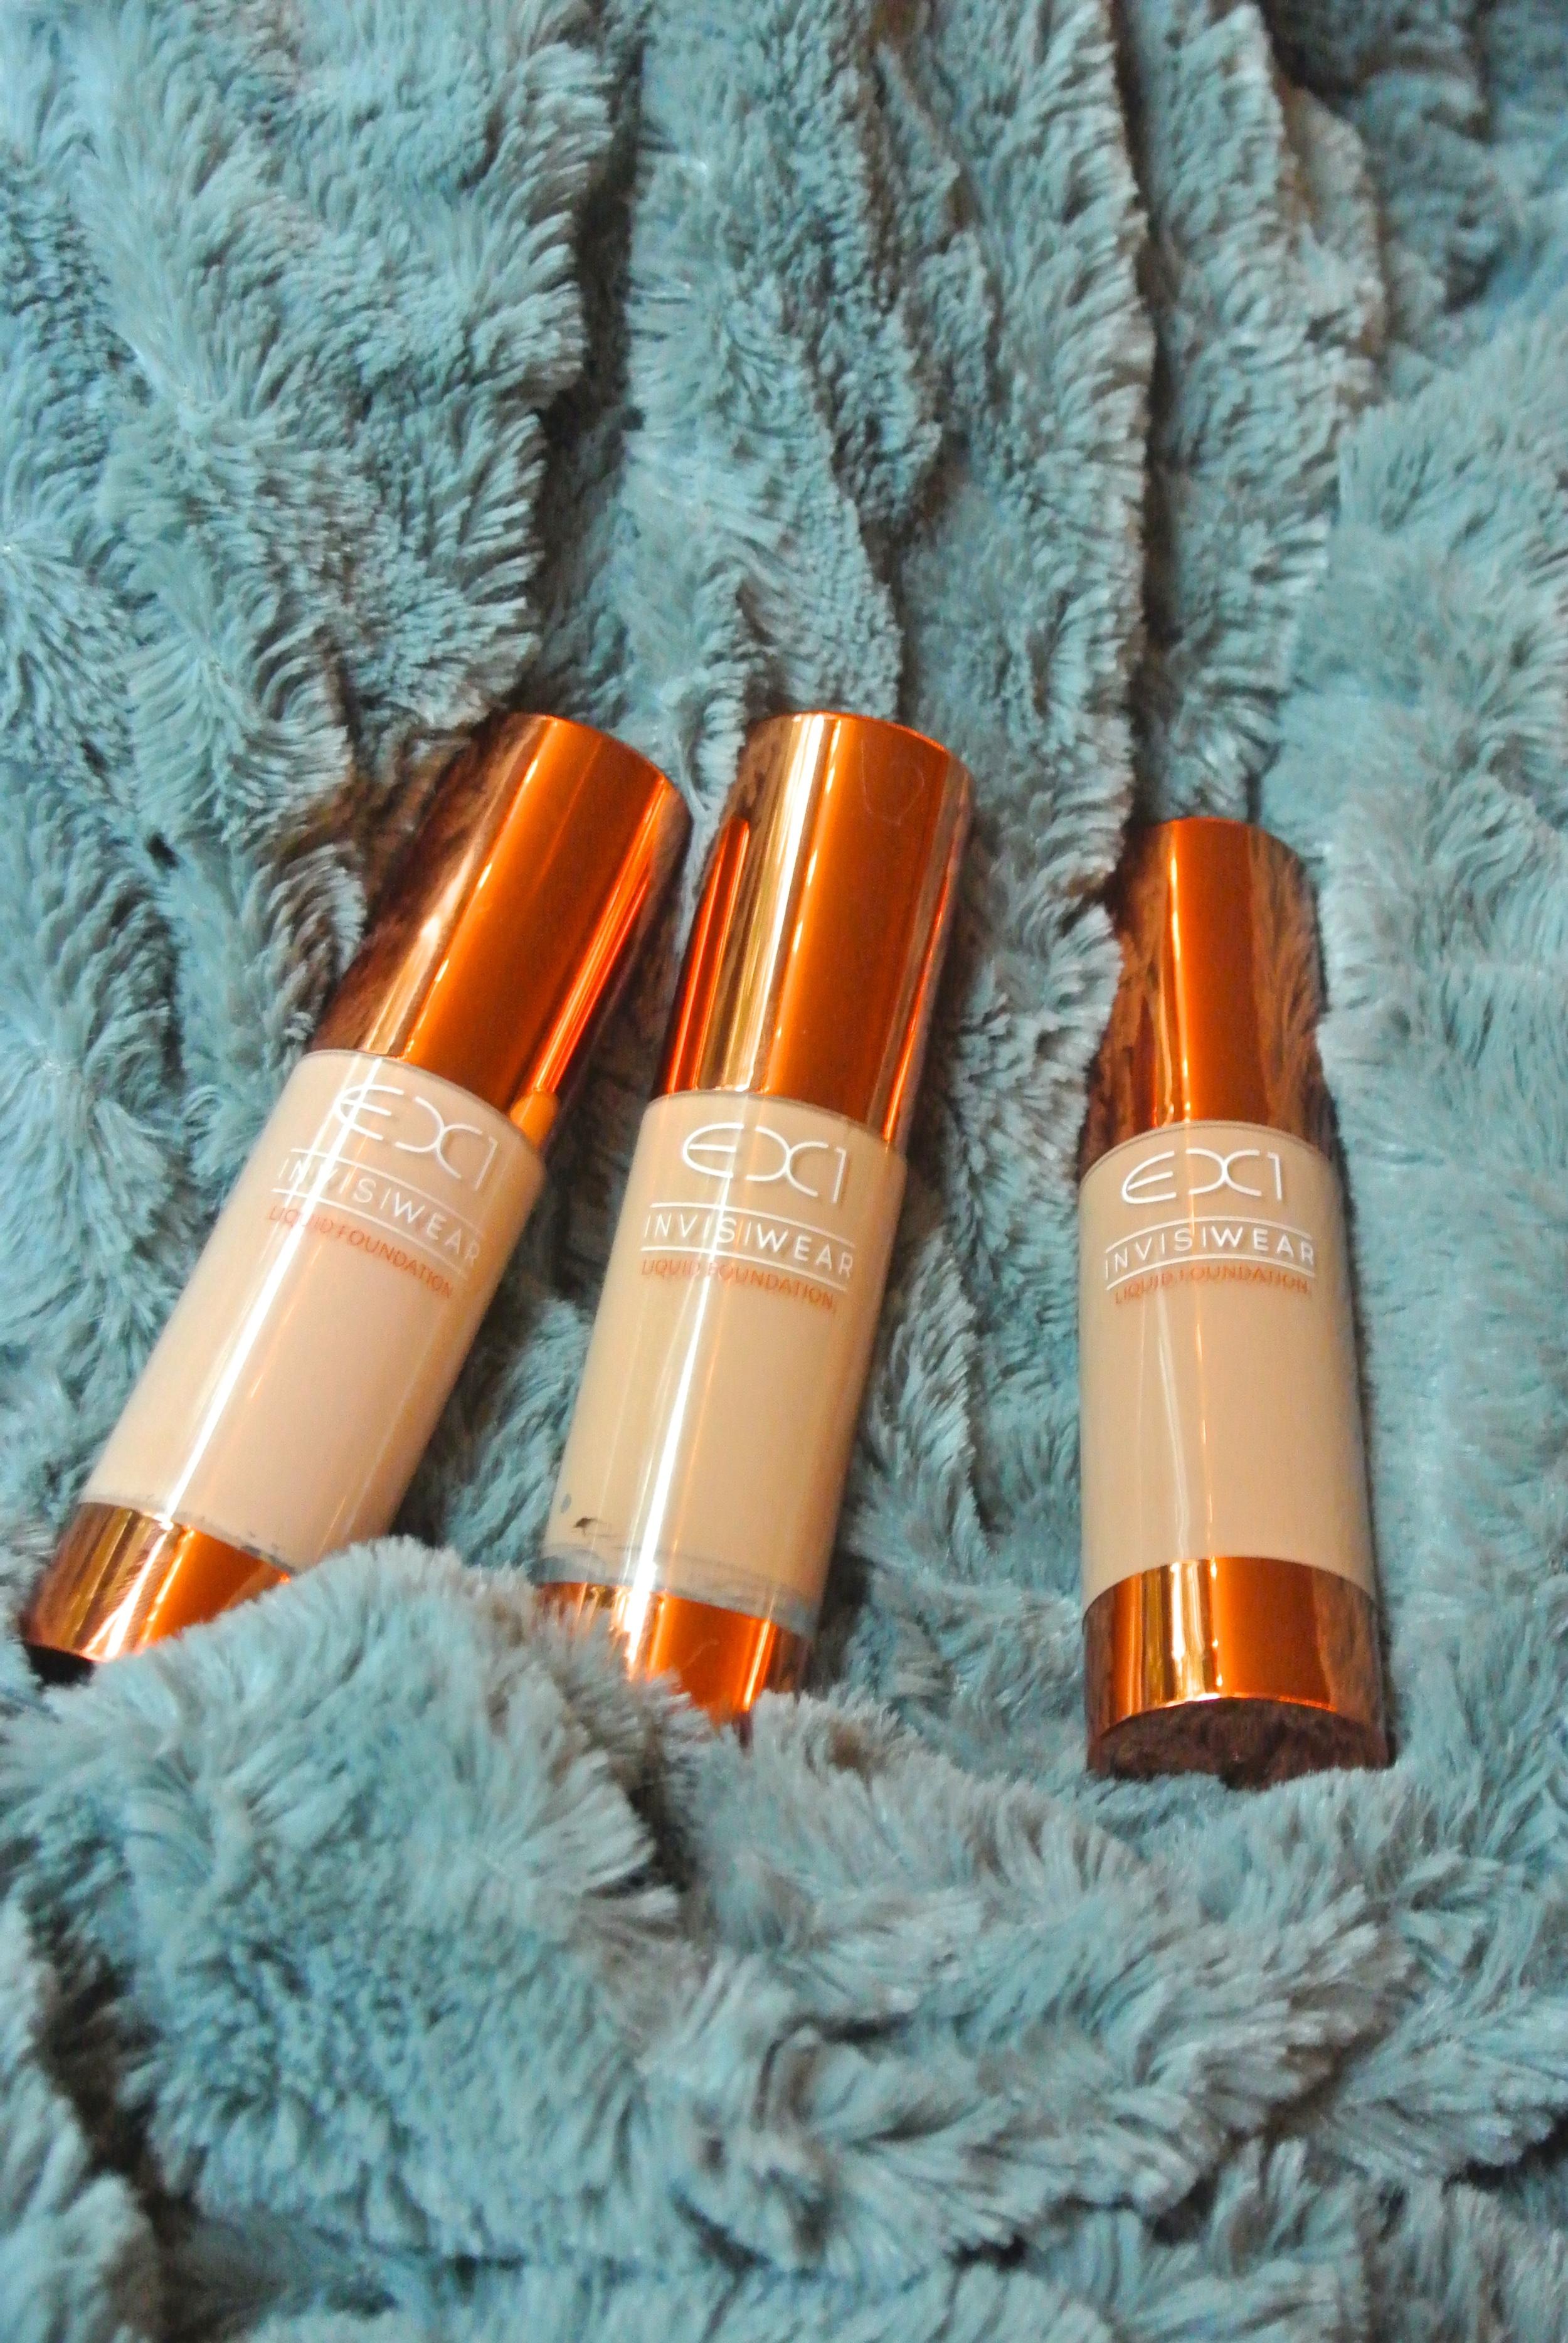 Ex1 Cosmetics Invisiwear Liquid Foundation.L to R: F100, F200, F300